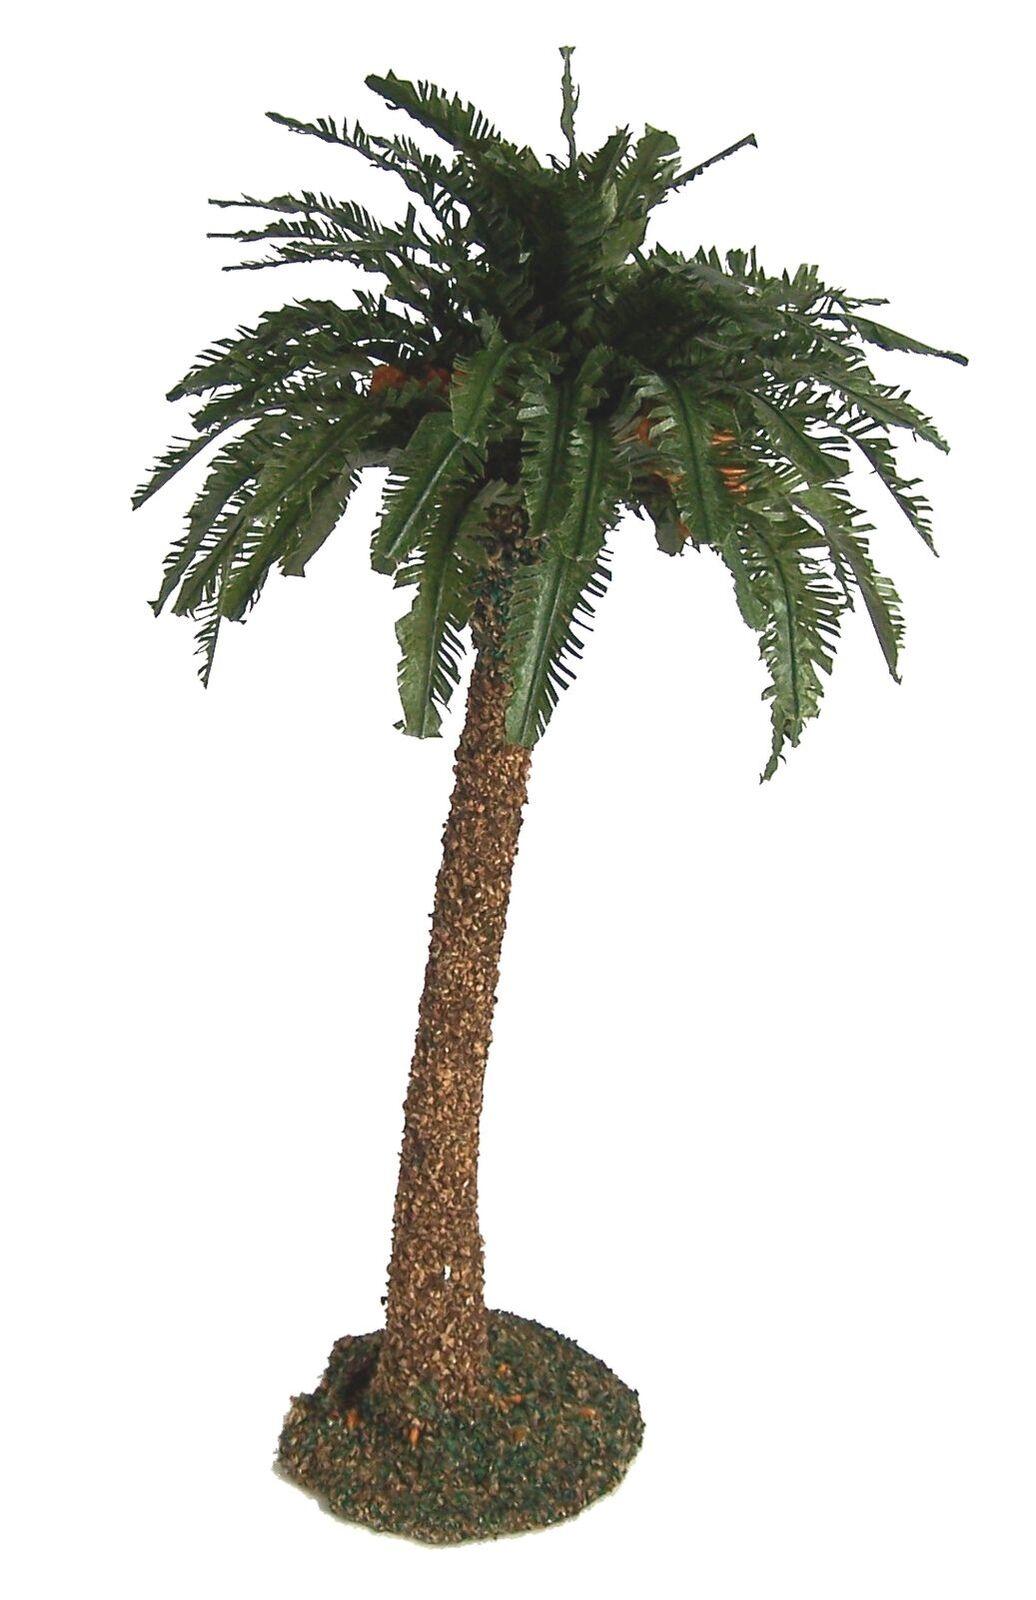 Belenes Puig Stoff Palme. Handarbeit. 32 cm. cm. cm. Krippenbotanik. Weihnachtskrippe b38956